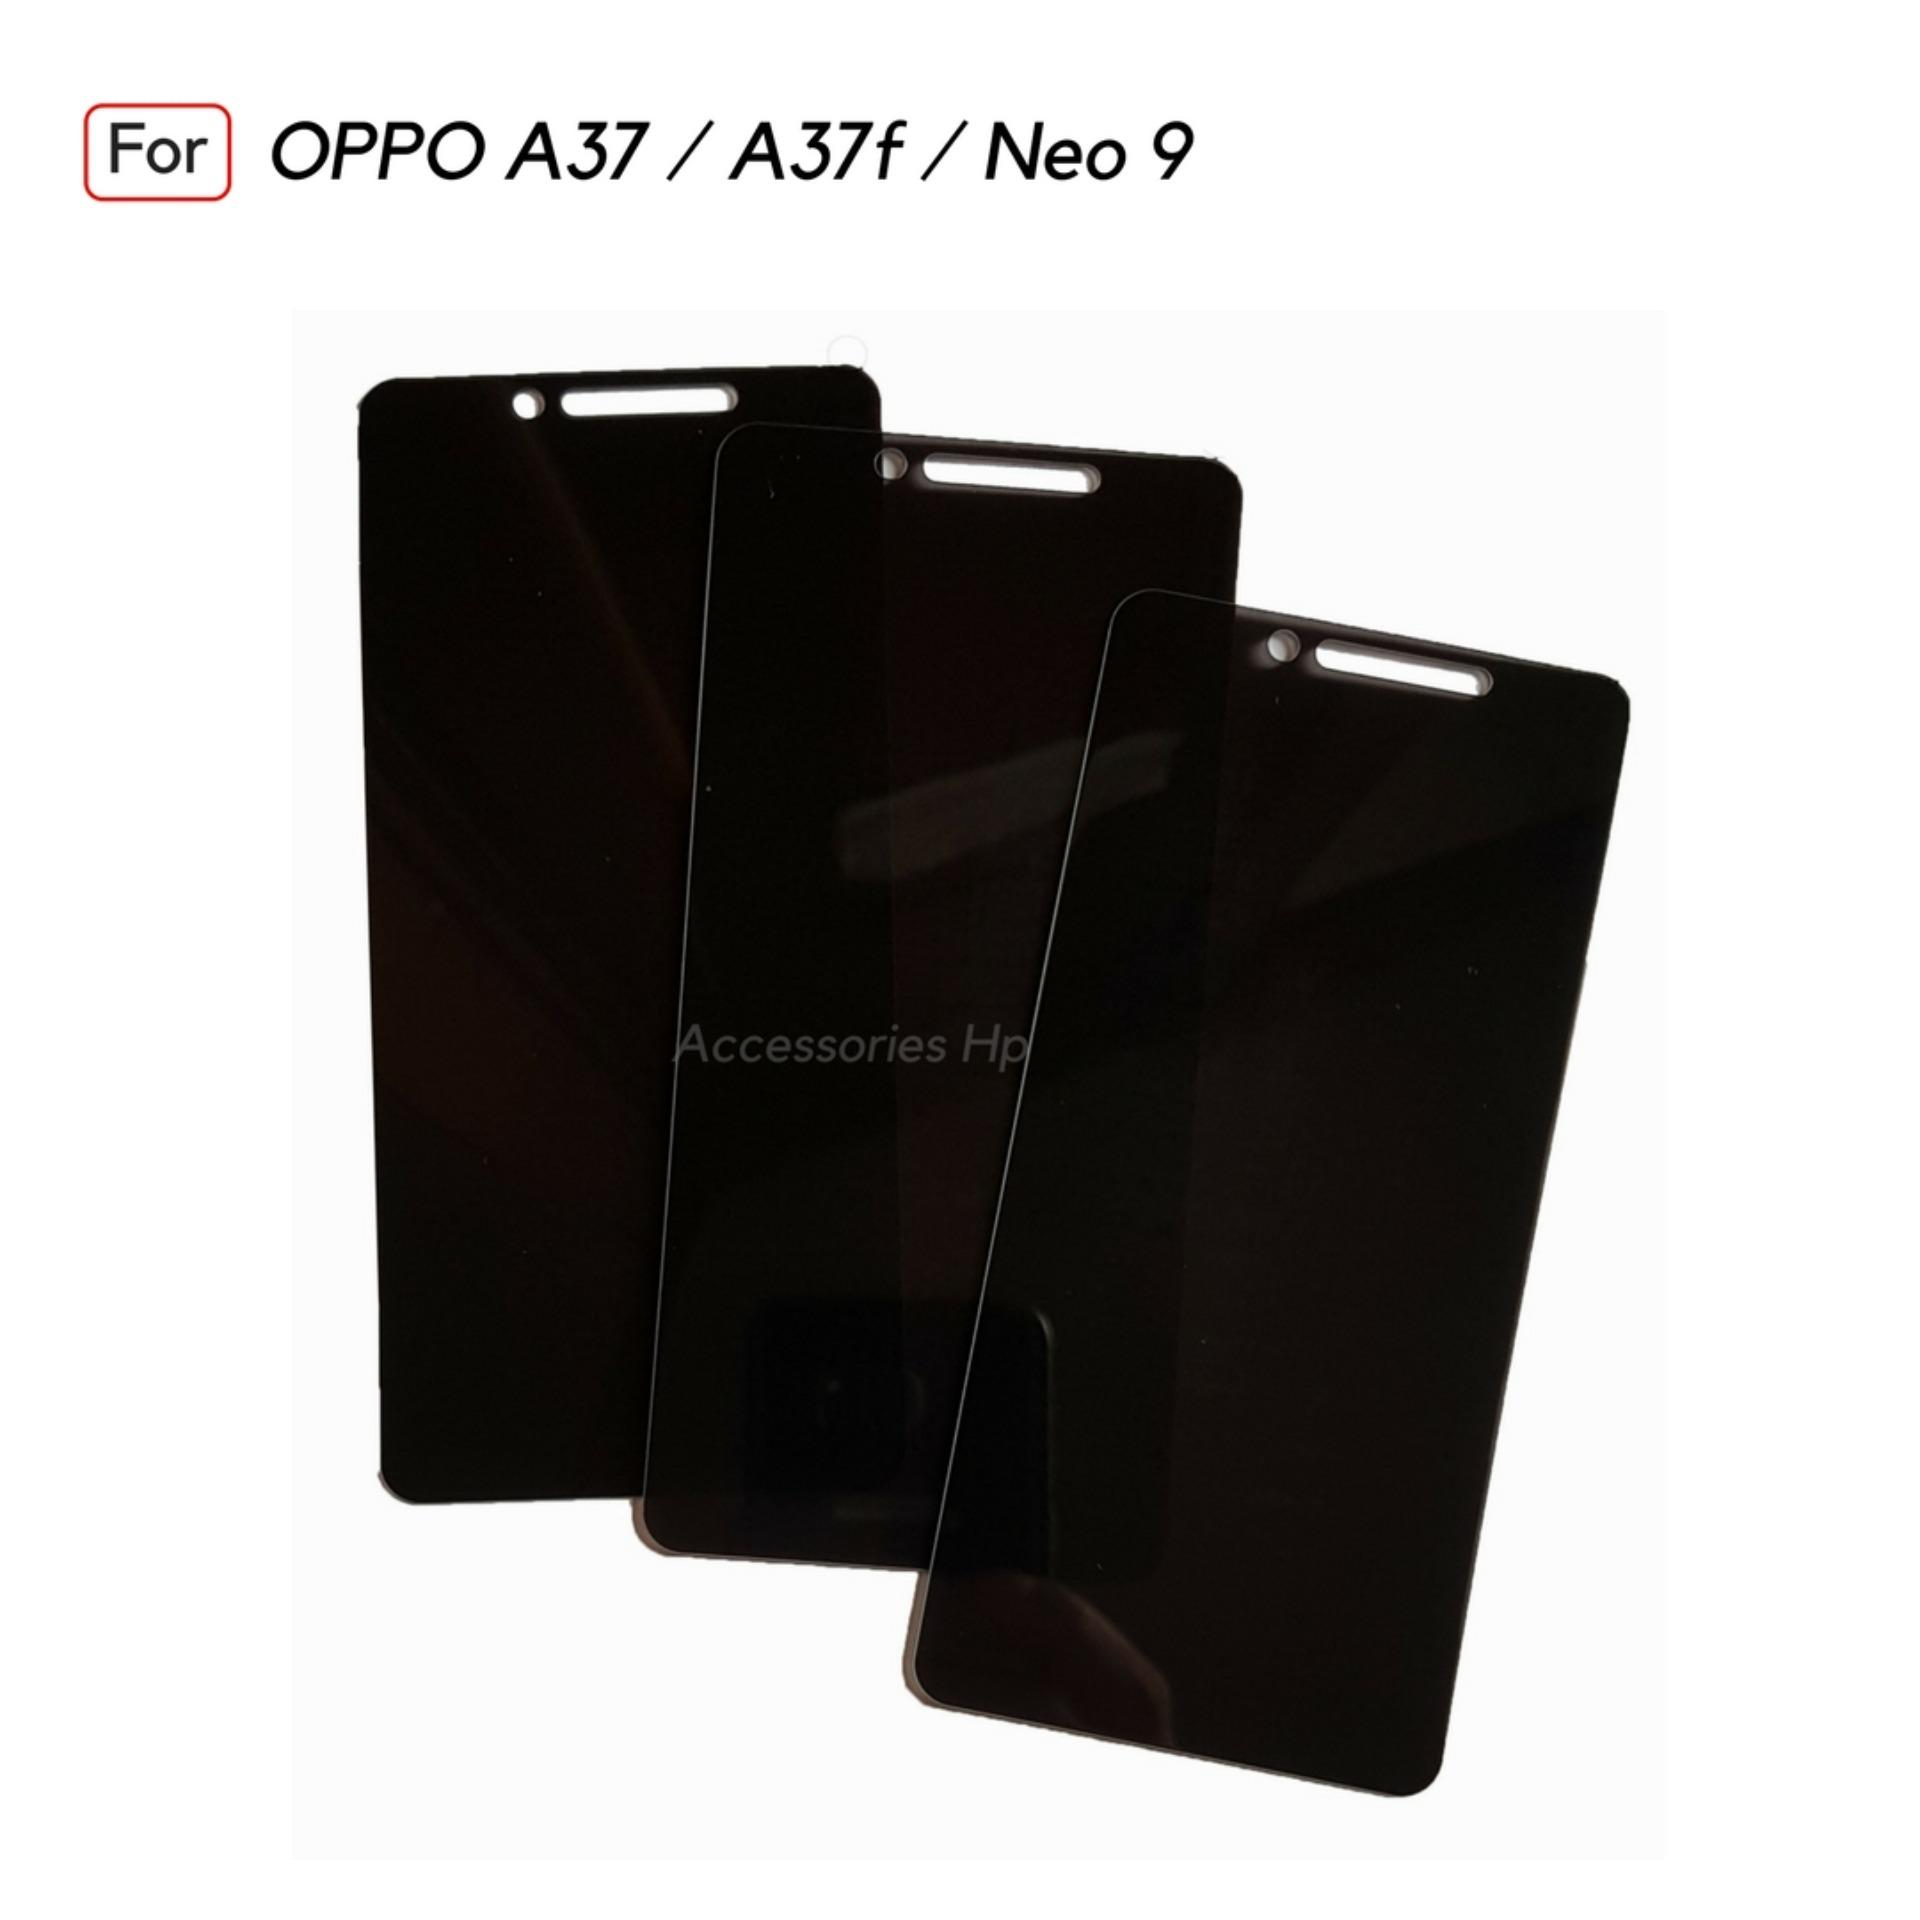 Pencarian Termurah Accessories Hp ANTI SPY Tempered Glass Premium Screen Protector Privacy For Oppo A37 / A7f / Neo 9 harga penawaran - Hanya Rp19.736